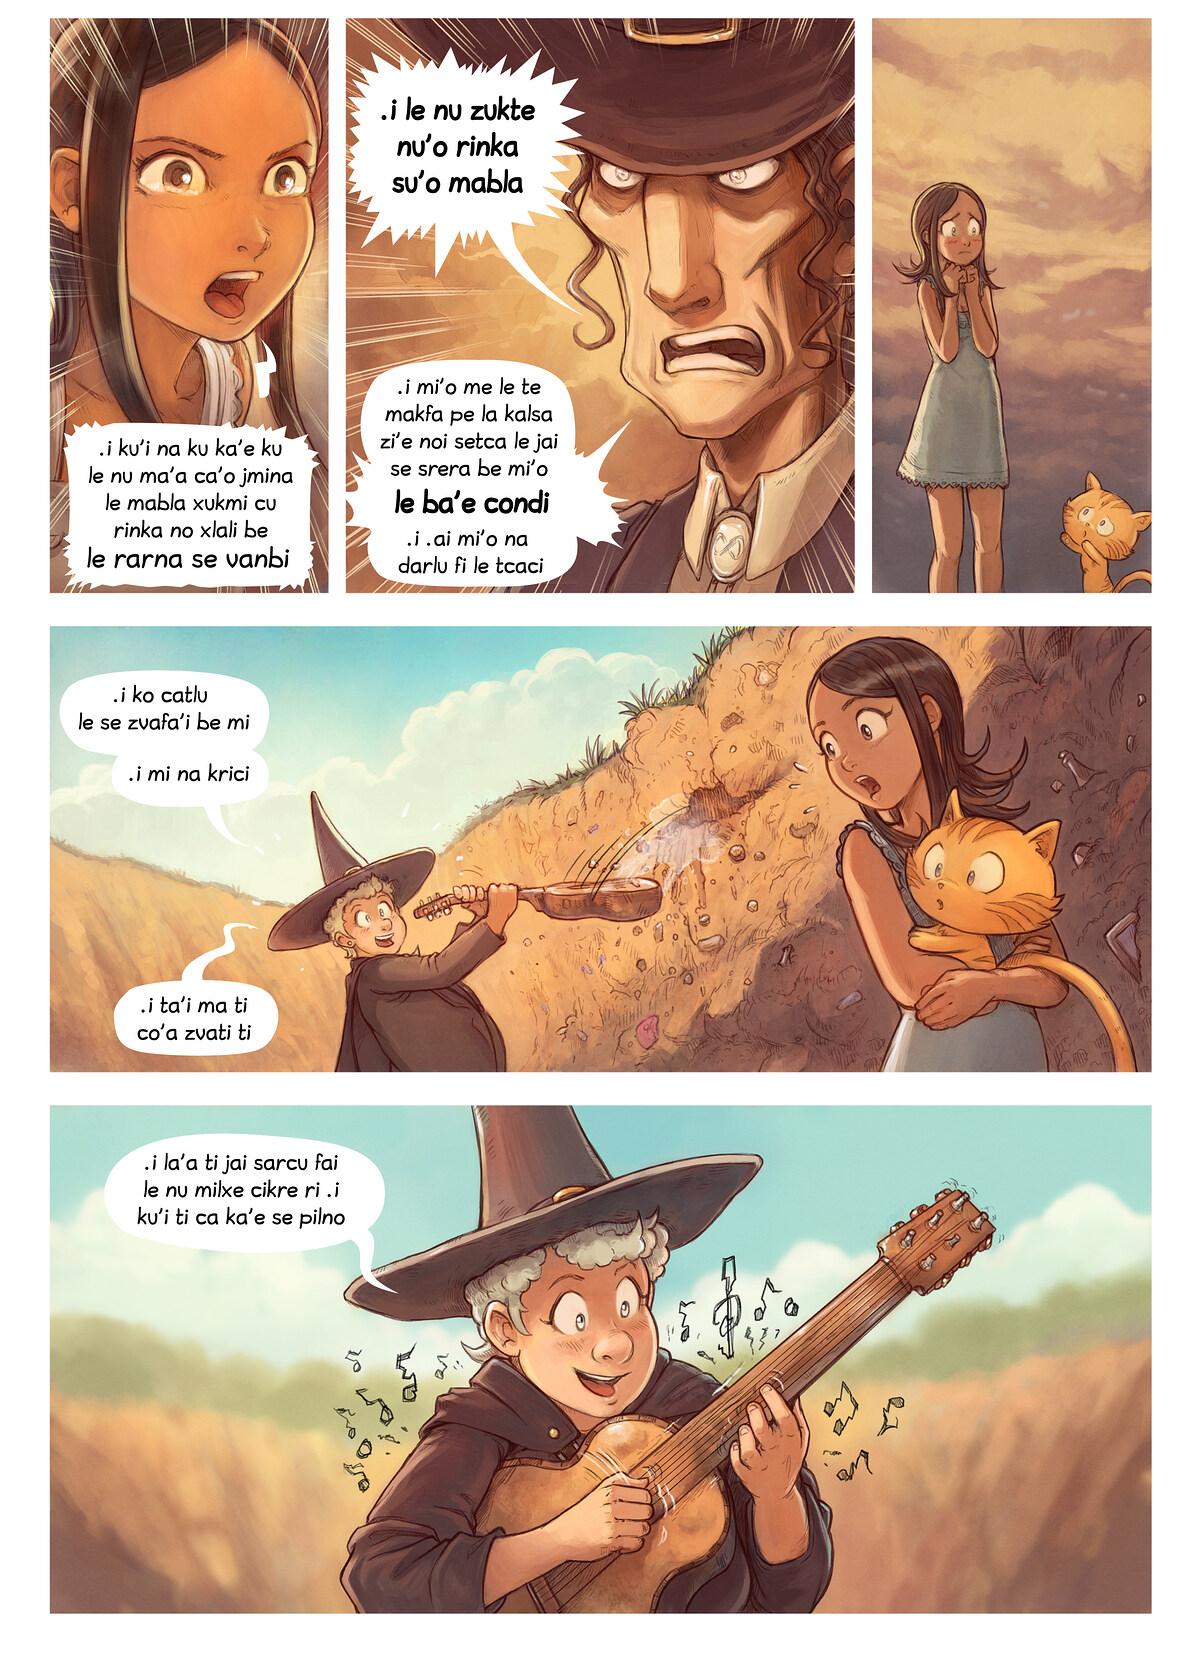 A webcomic page of Pepper&Carrot, pagbu 19 [jb], papri 6